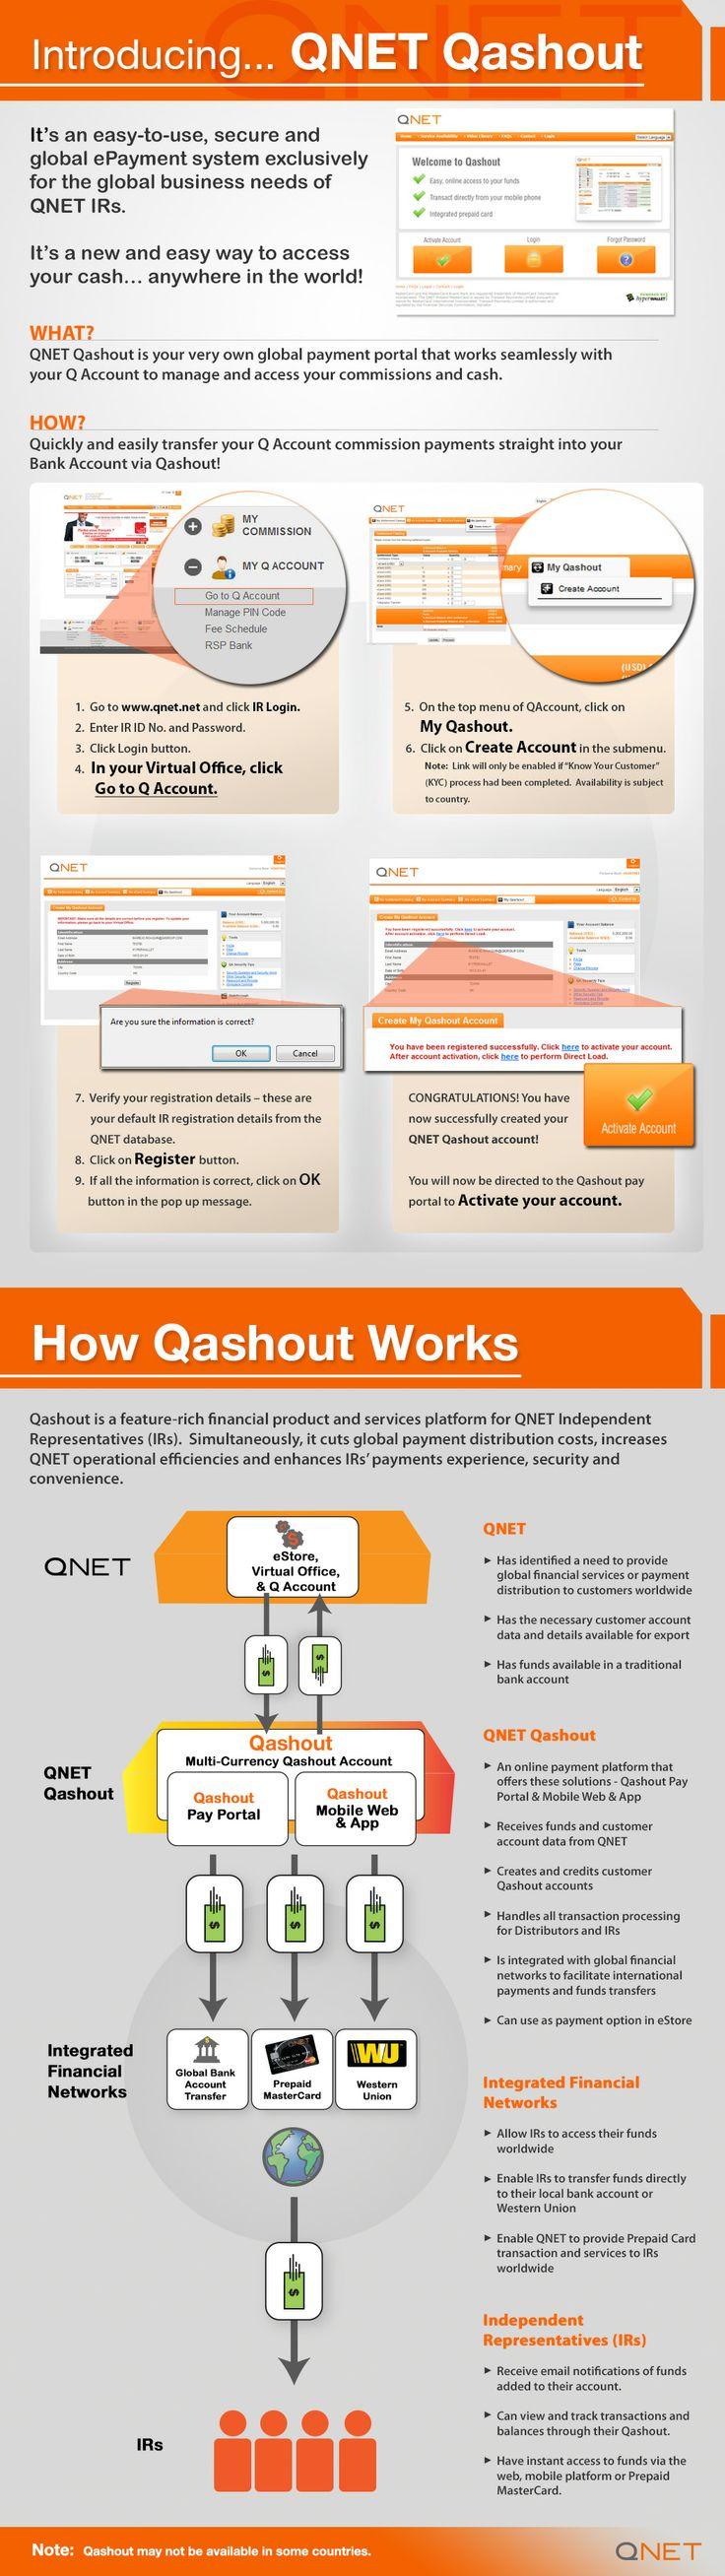 Introducing... QNET Qashout!